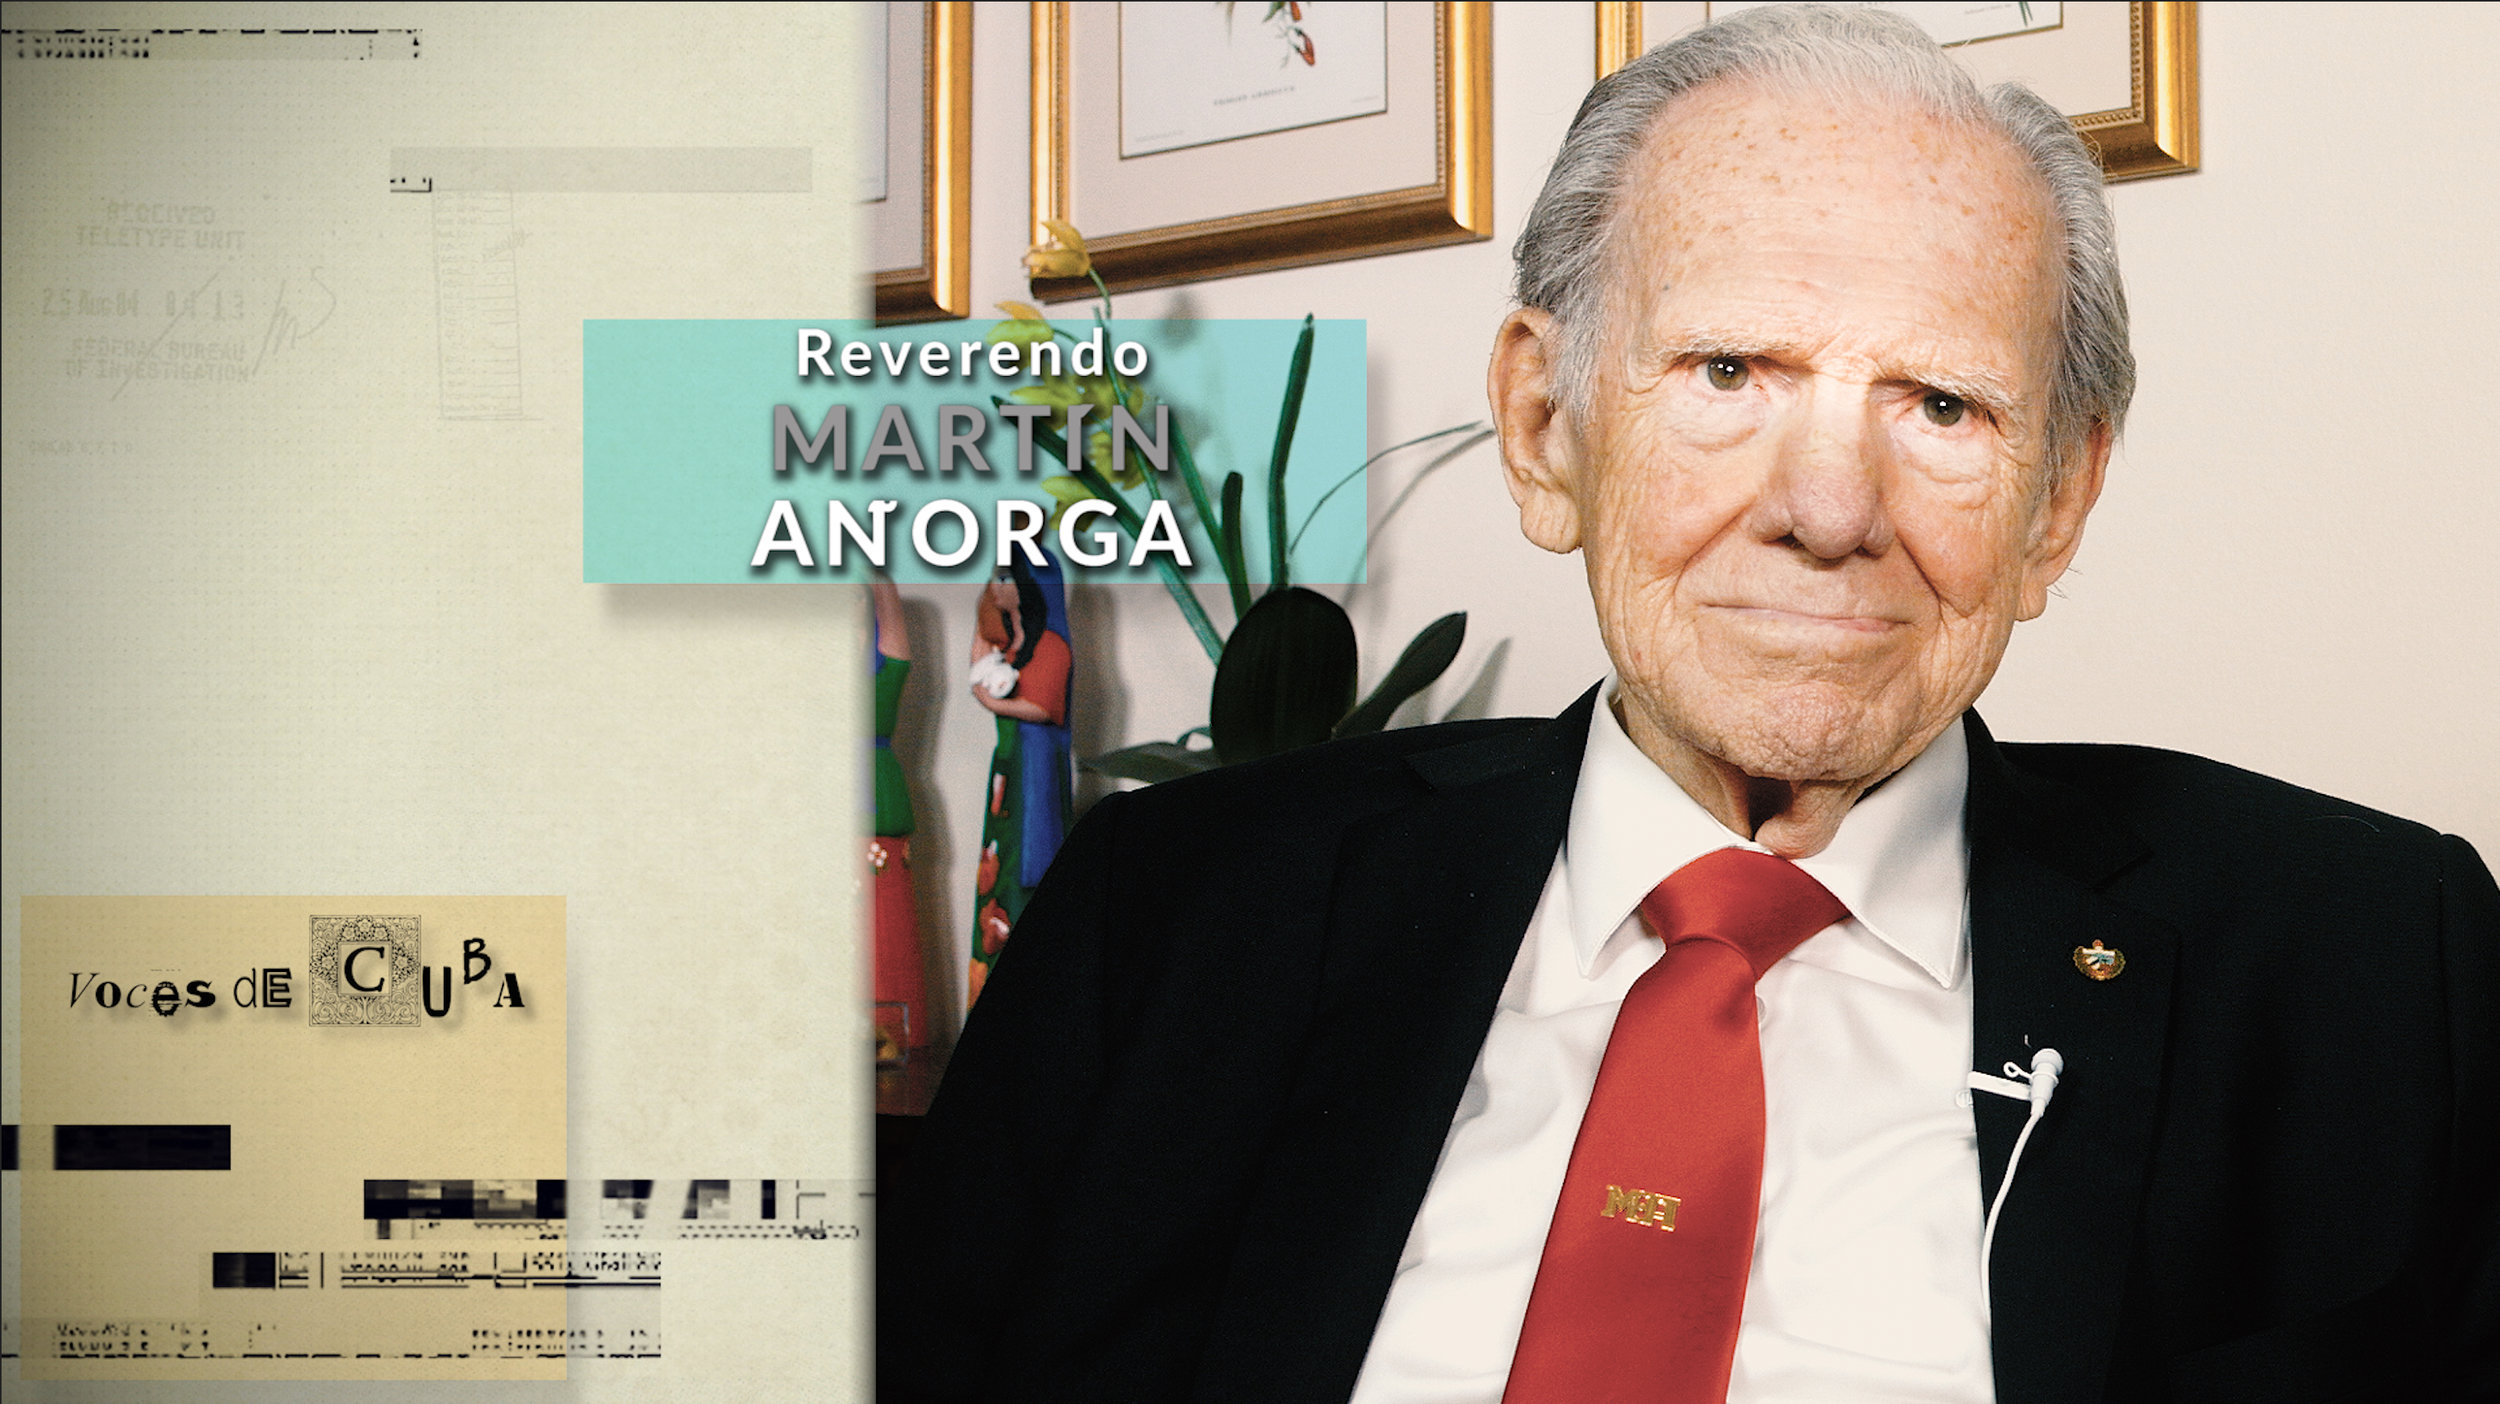 COVER ANORGA 2.jpg